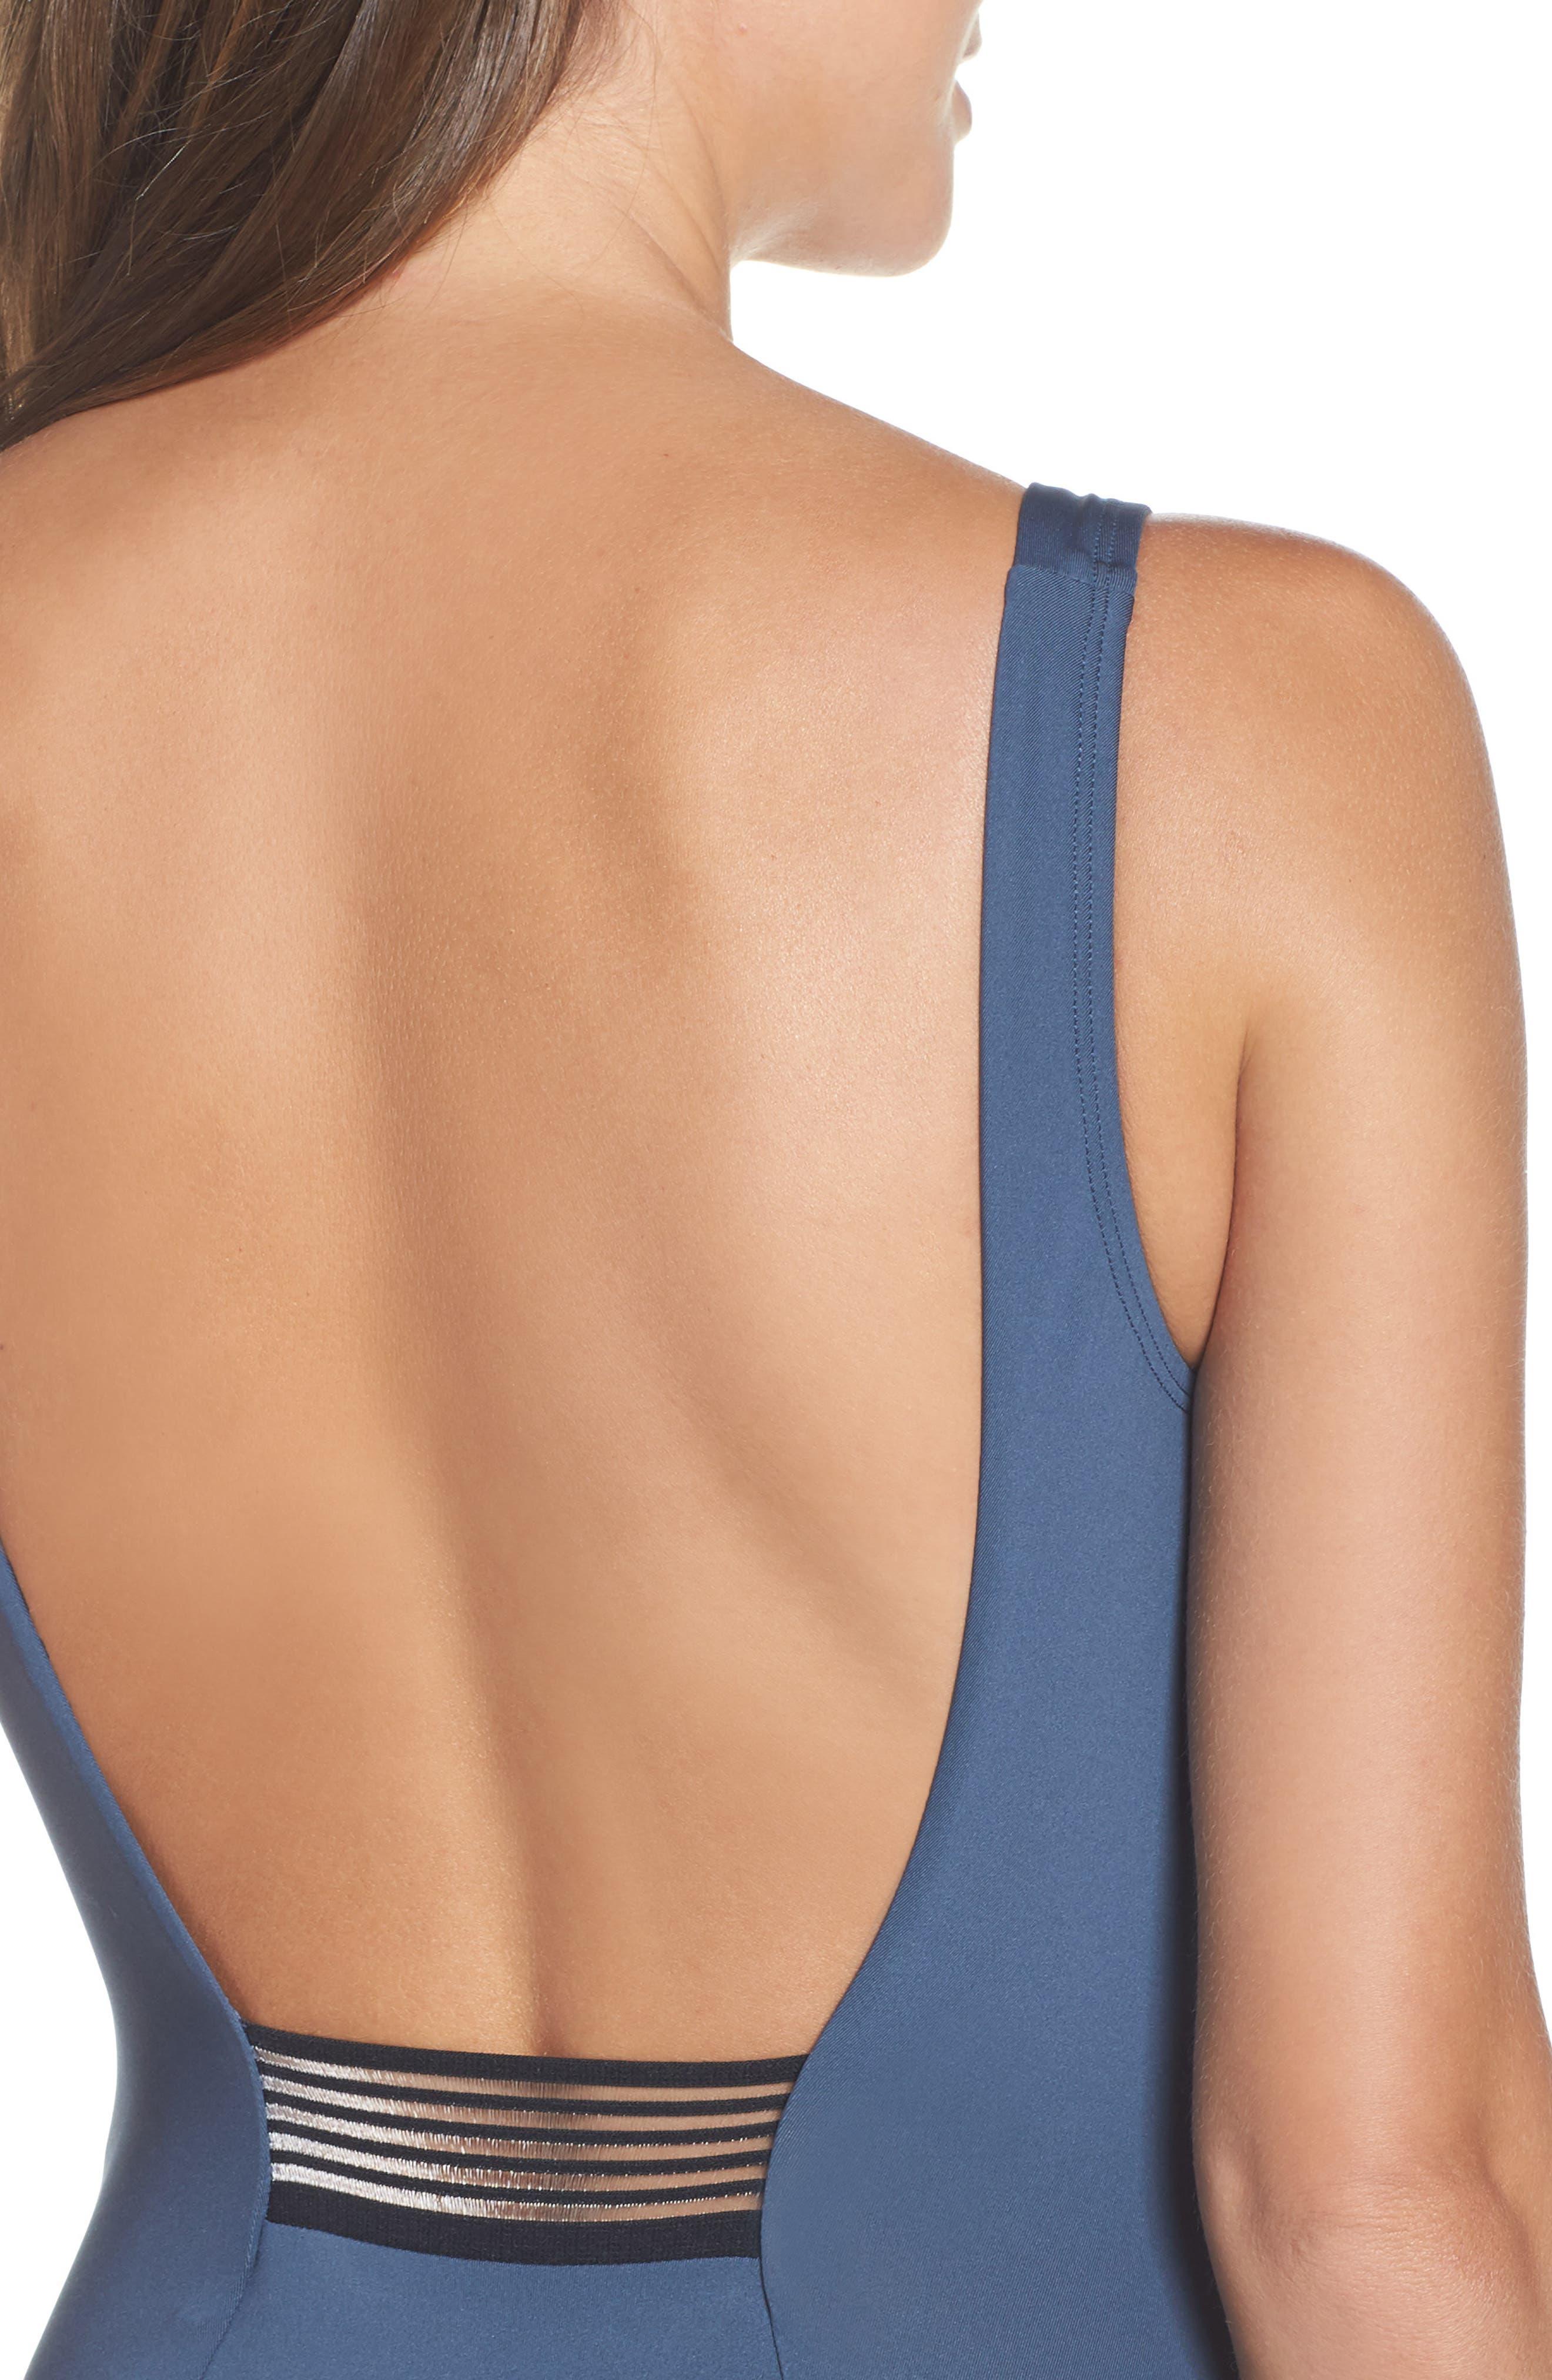 NIKE, U-Back One-Piece Swimsuit, Alternate thumbnail 4, color, MONSOON BLUE